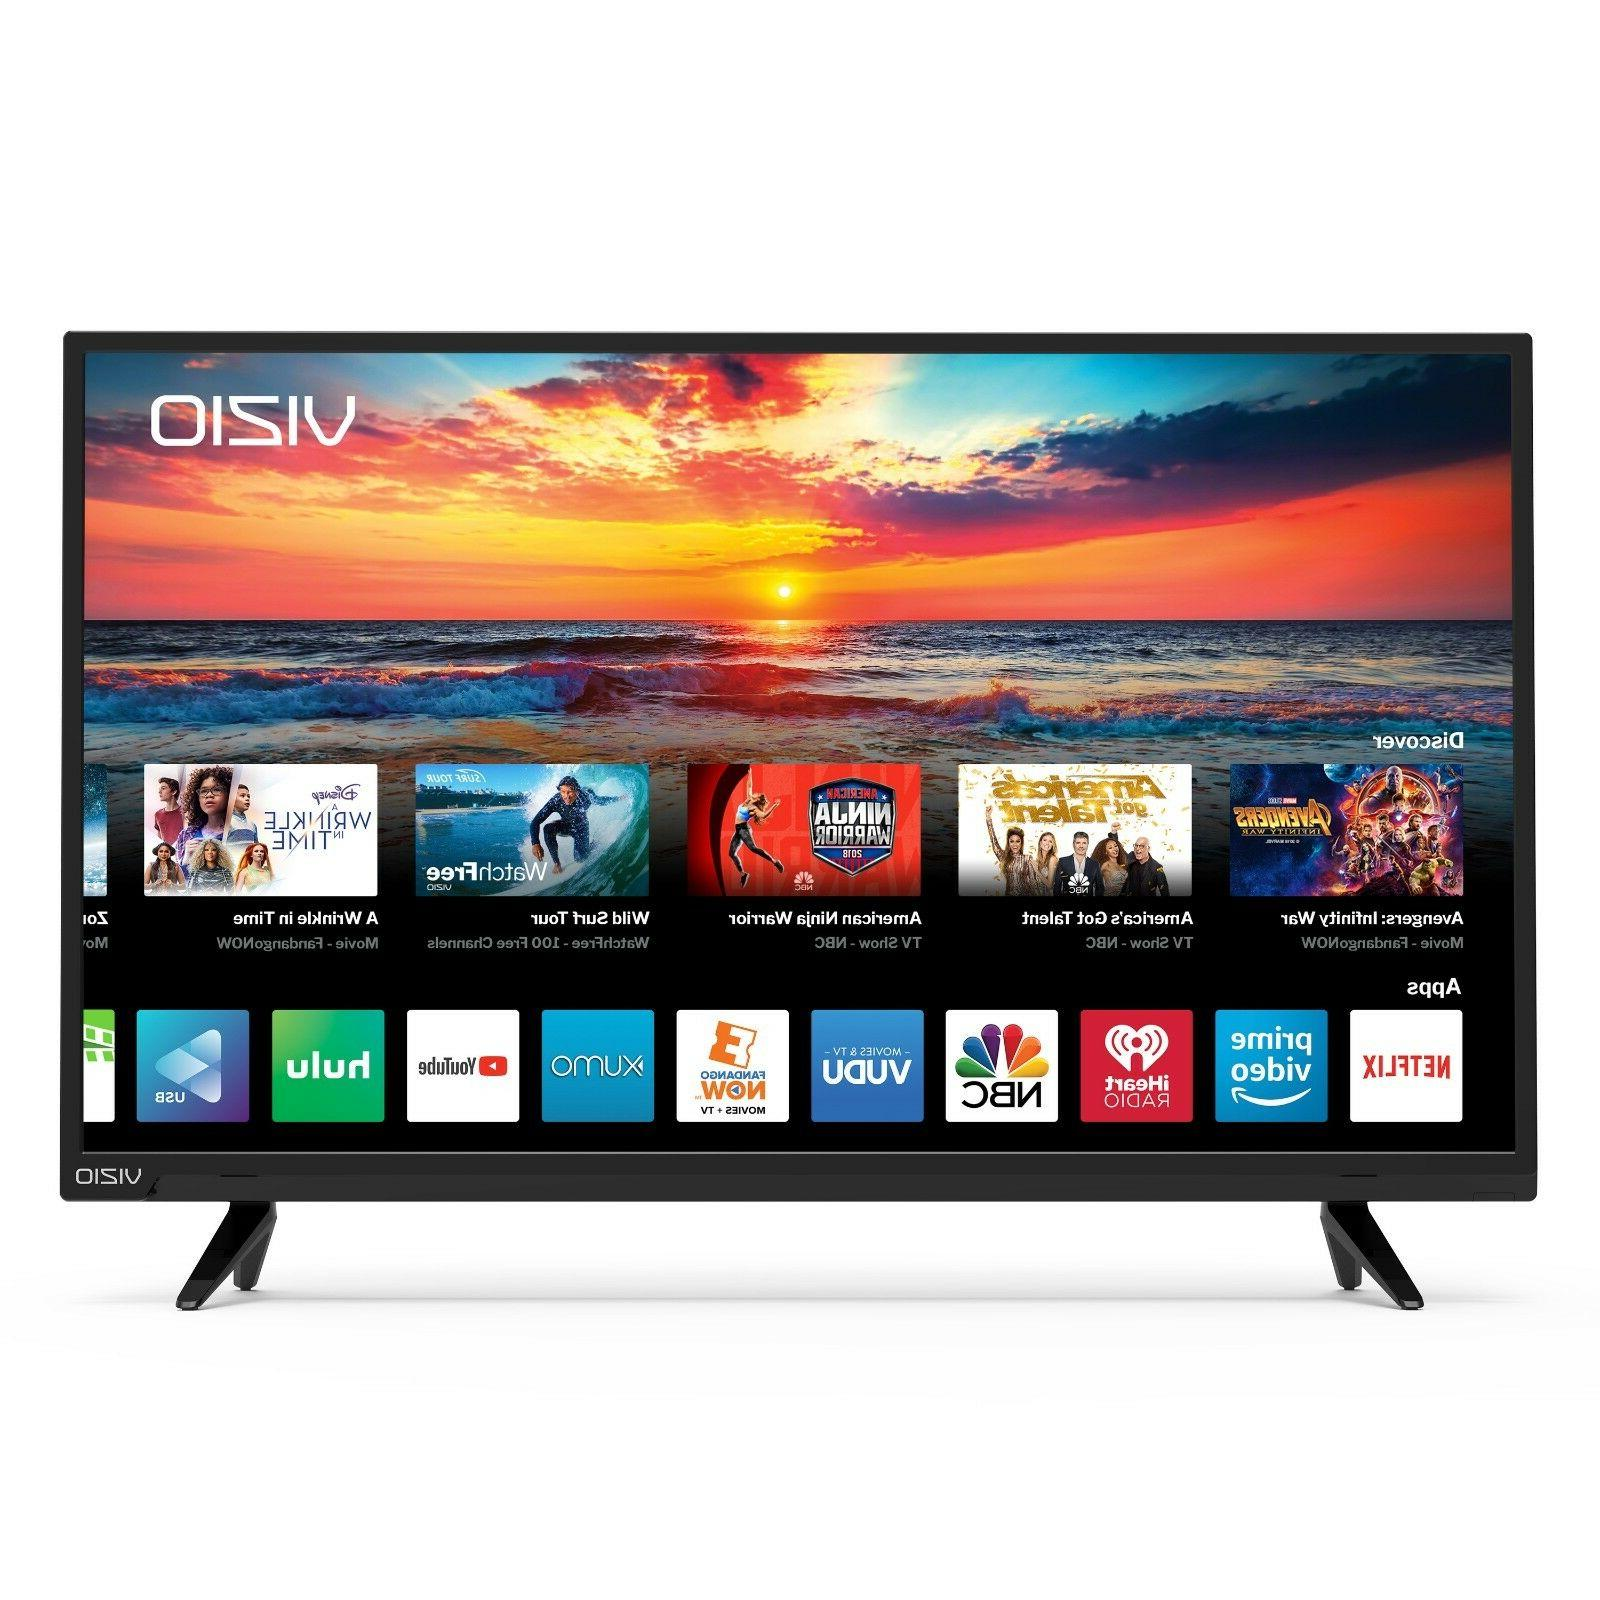 43 Inch Smart TV 1080P Resolution